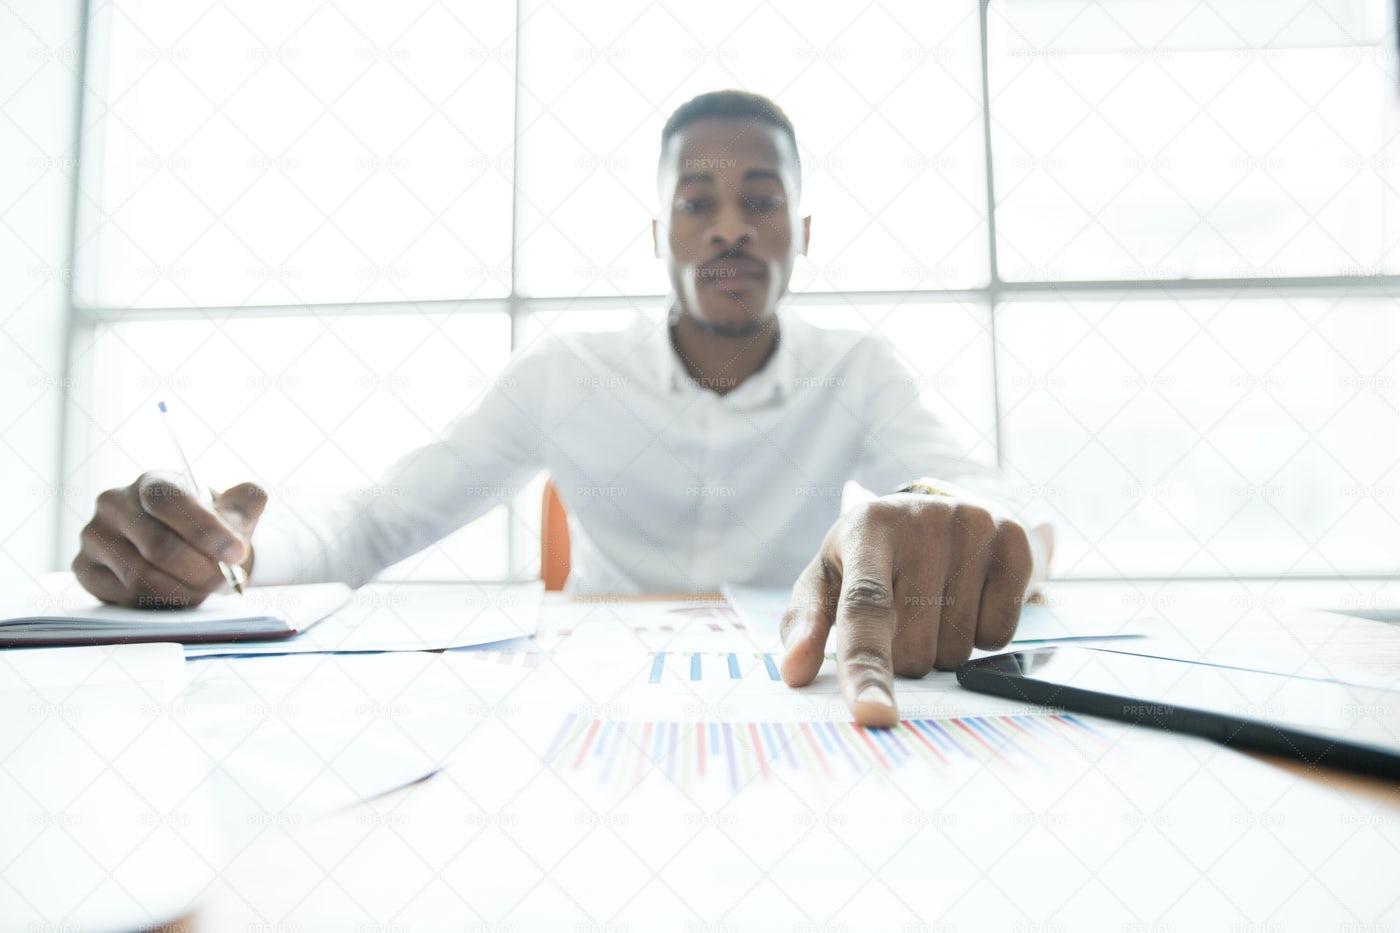 Concentrated Financial Advisor...: Stock Photos